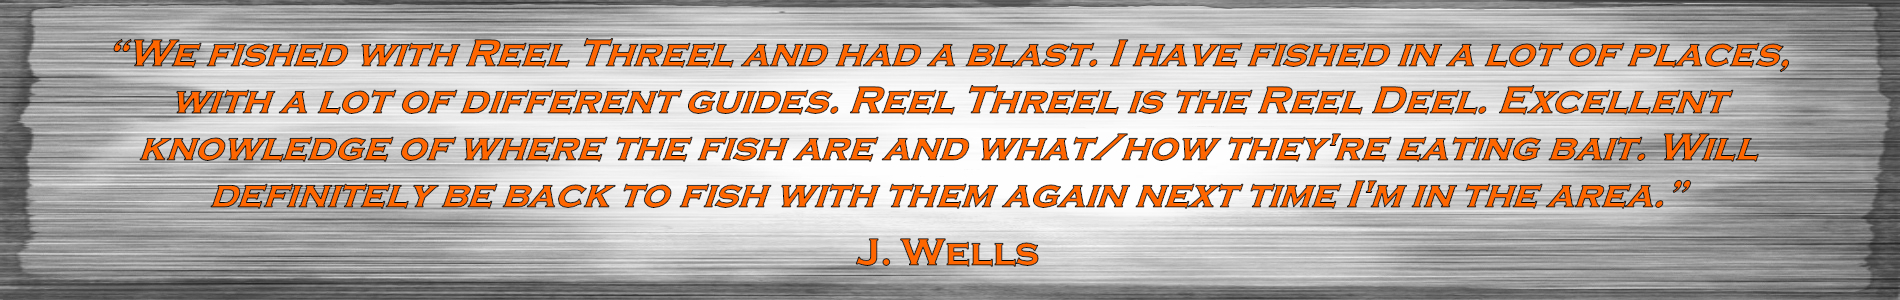 Wells_Testimonial